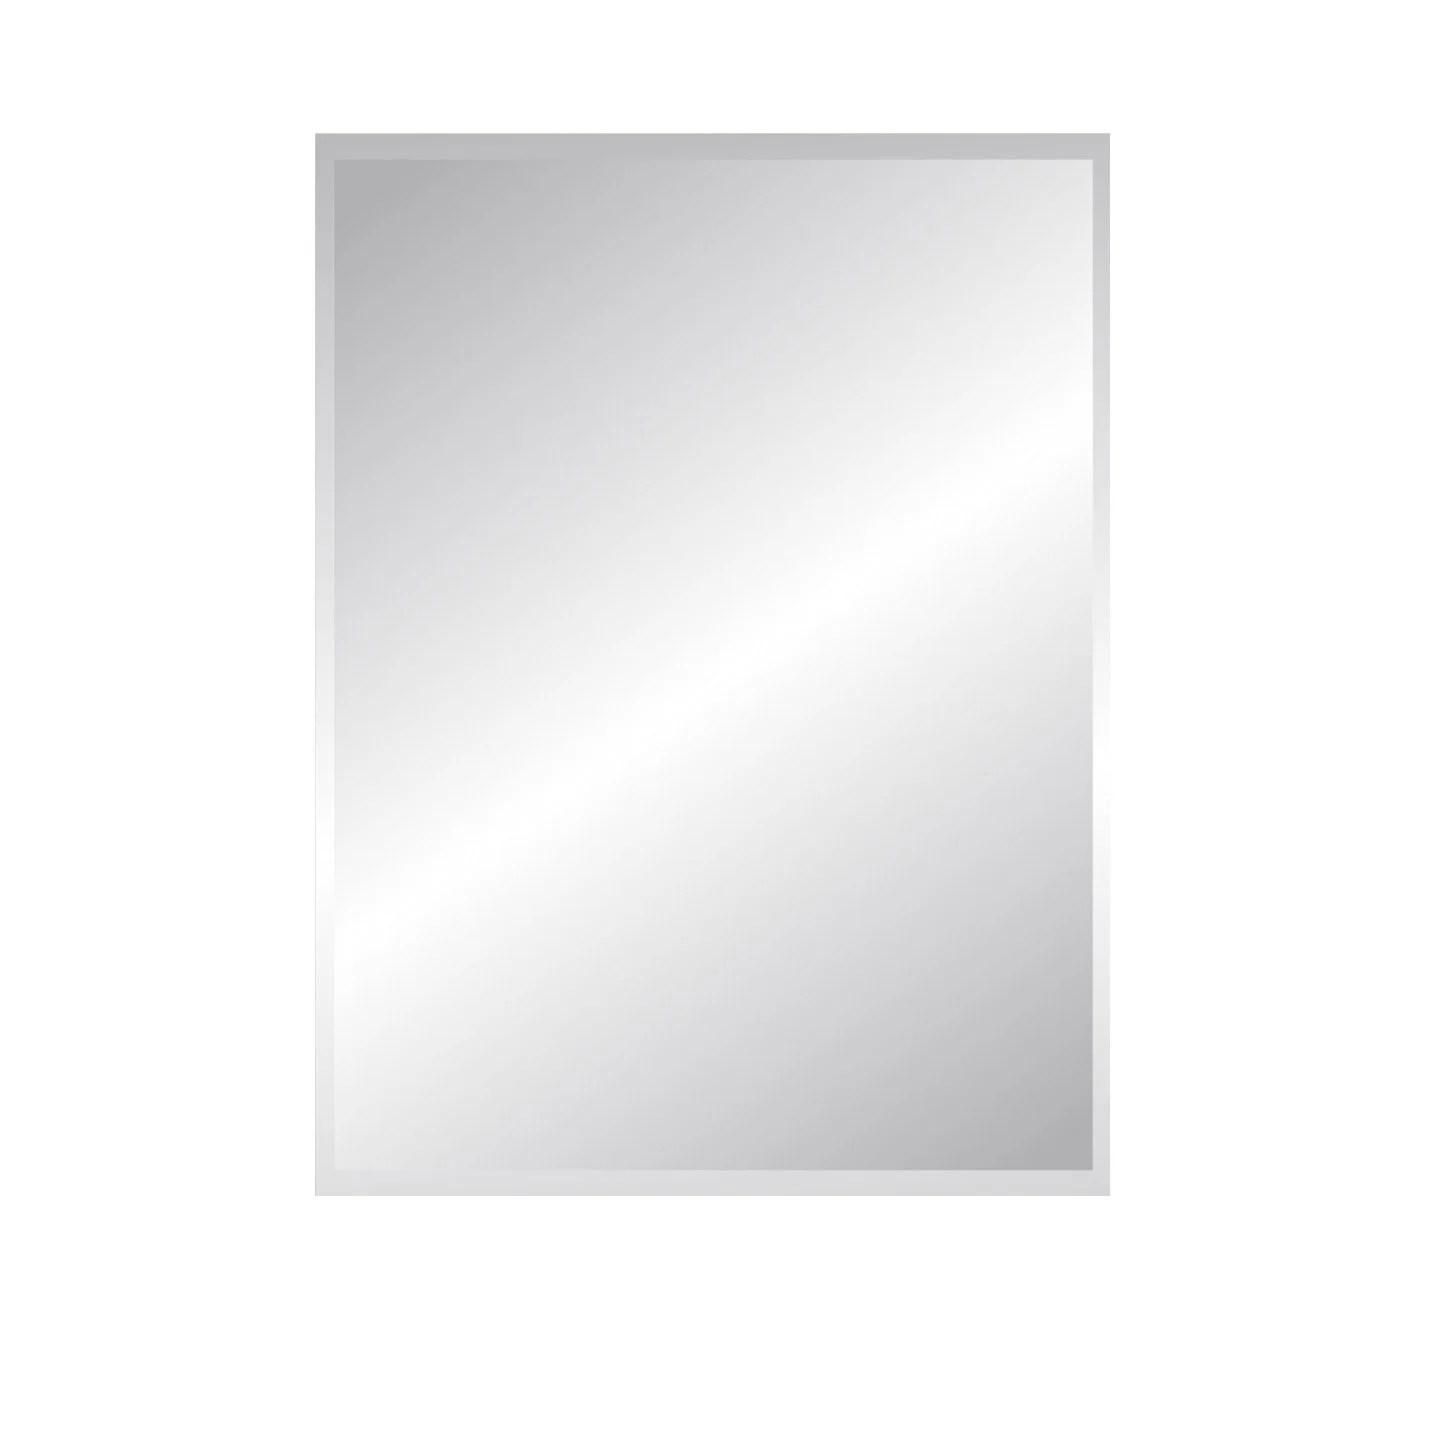 Miroir A Coller Leroy Merlin Gamboahinestrosa